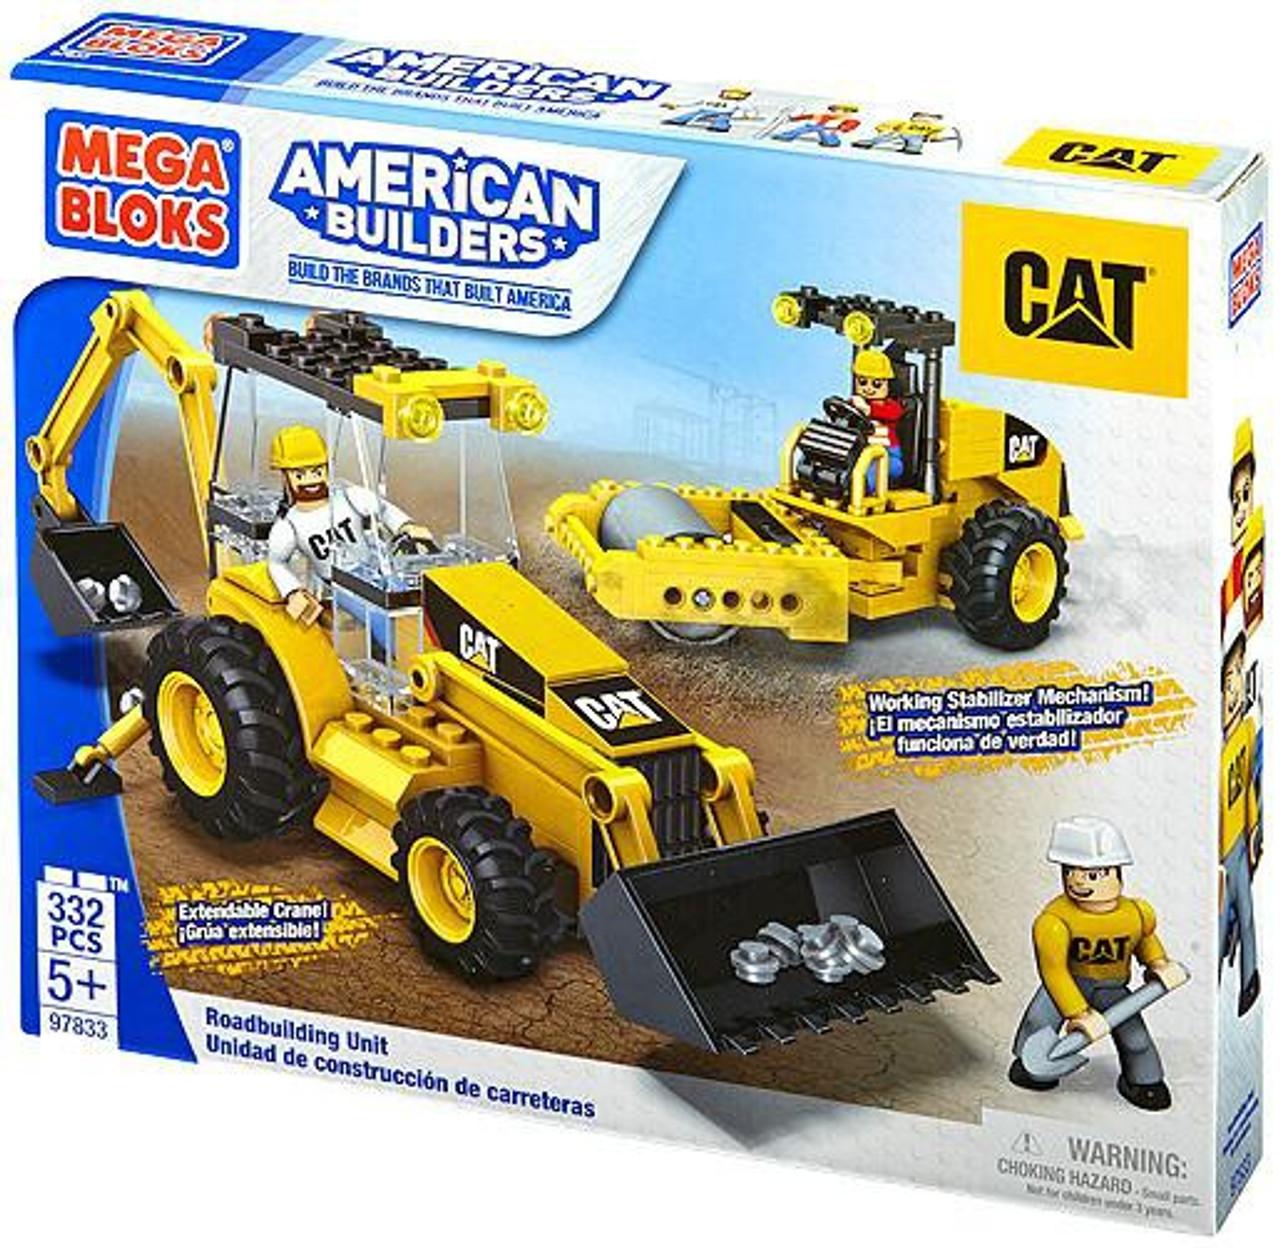 Mega Bloks American Builders Cat Roadbuilding Unit Set 97833 Toywiz